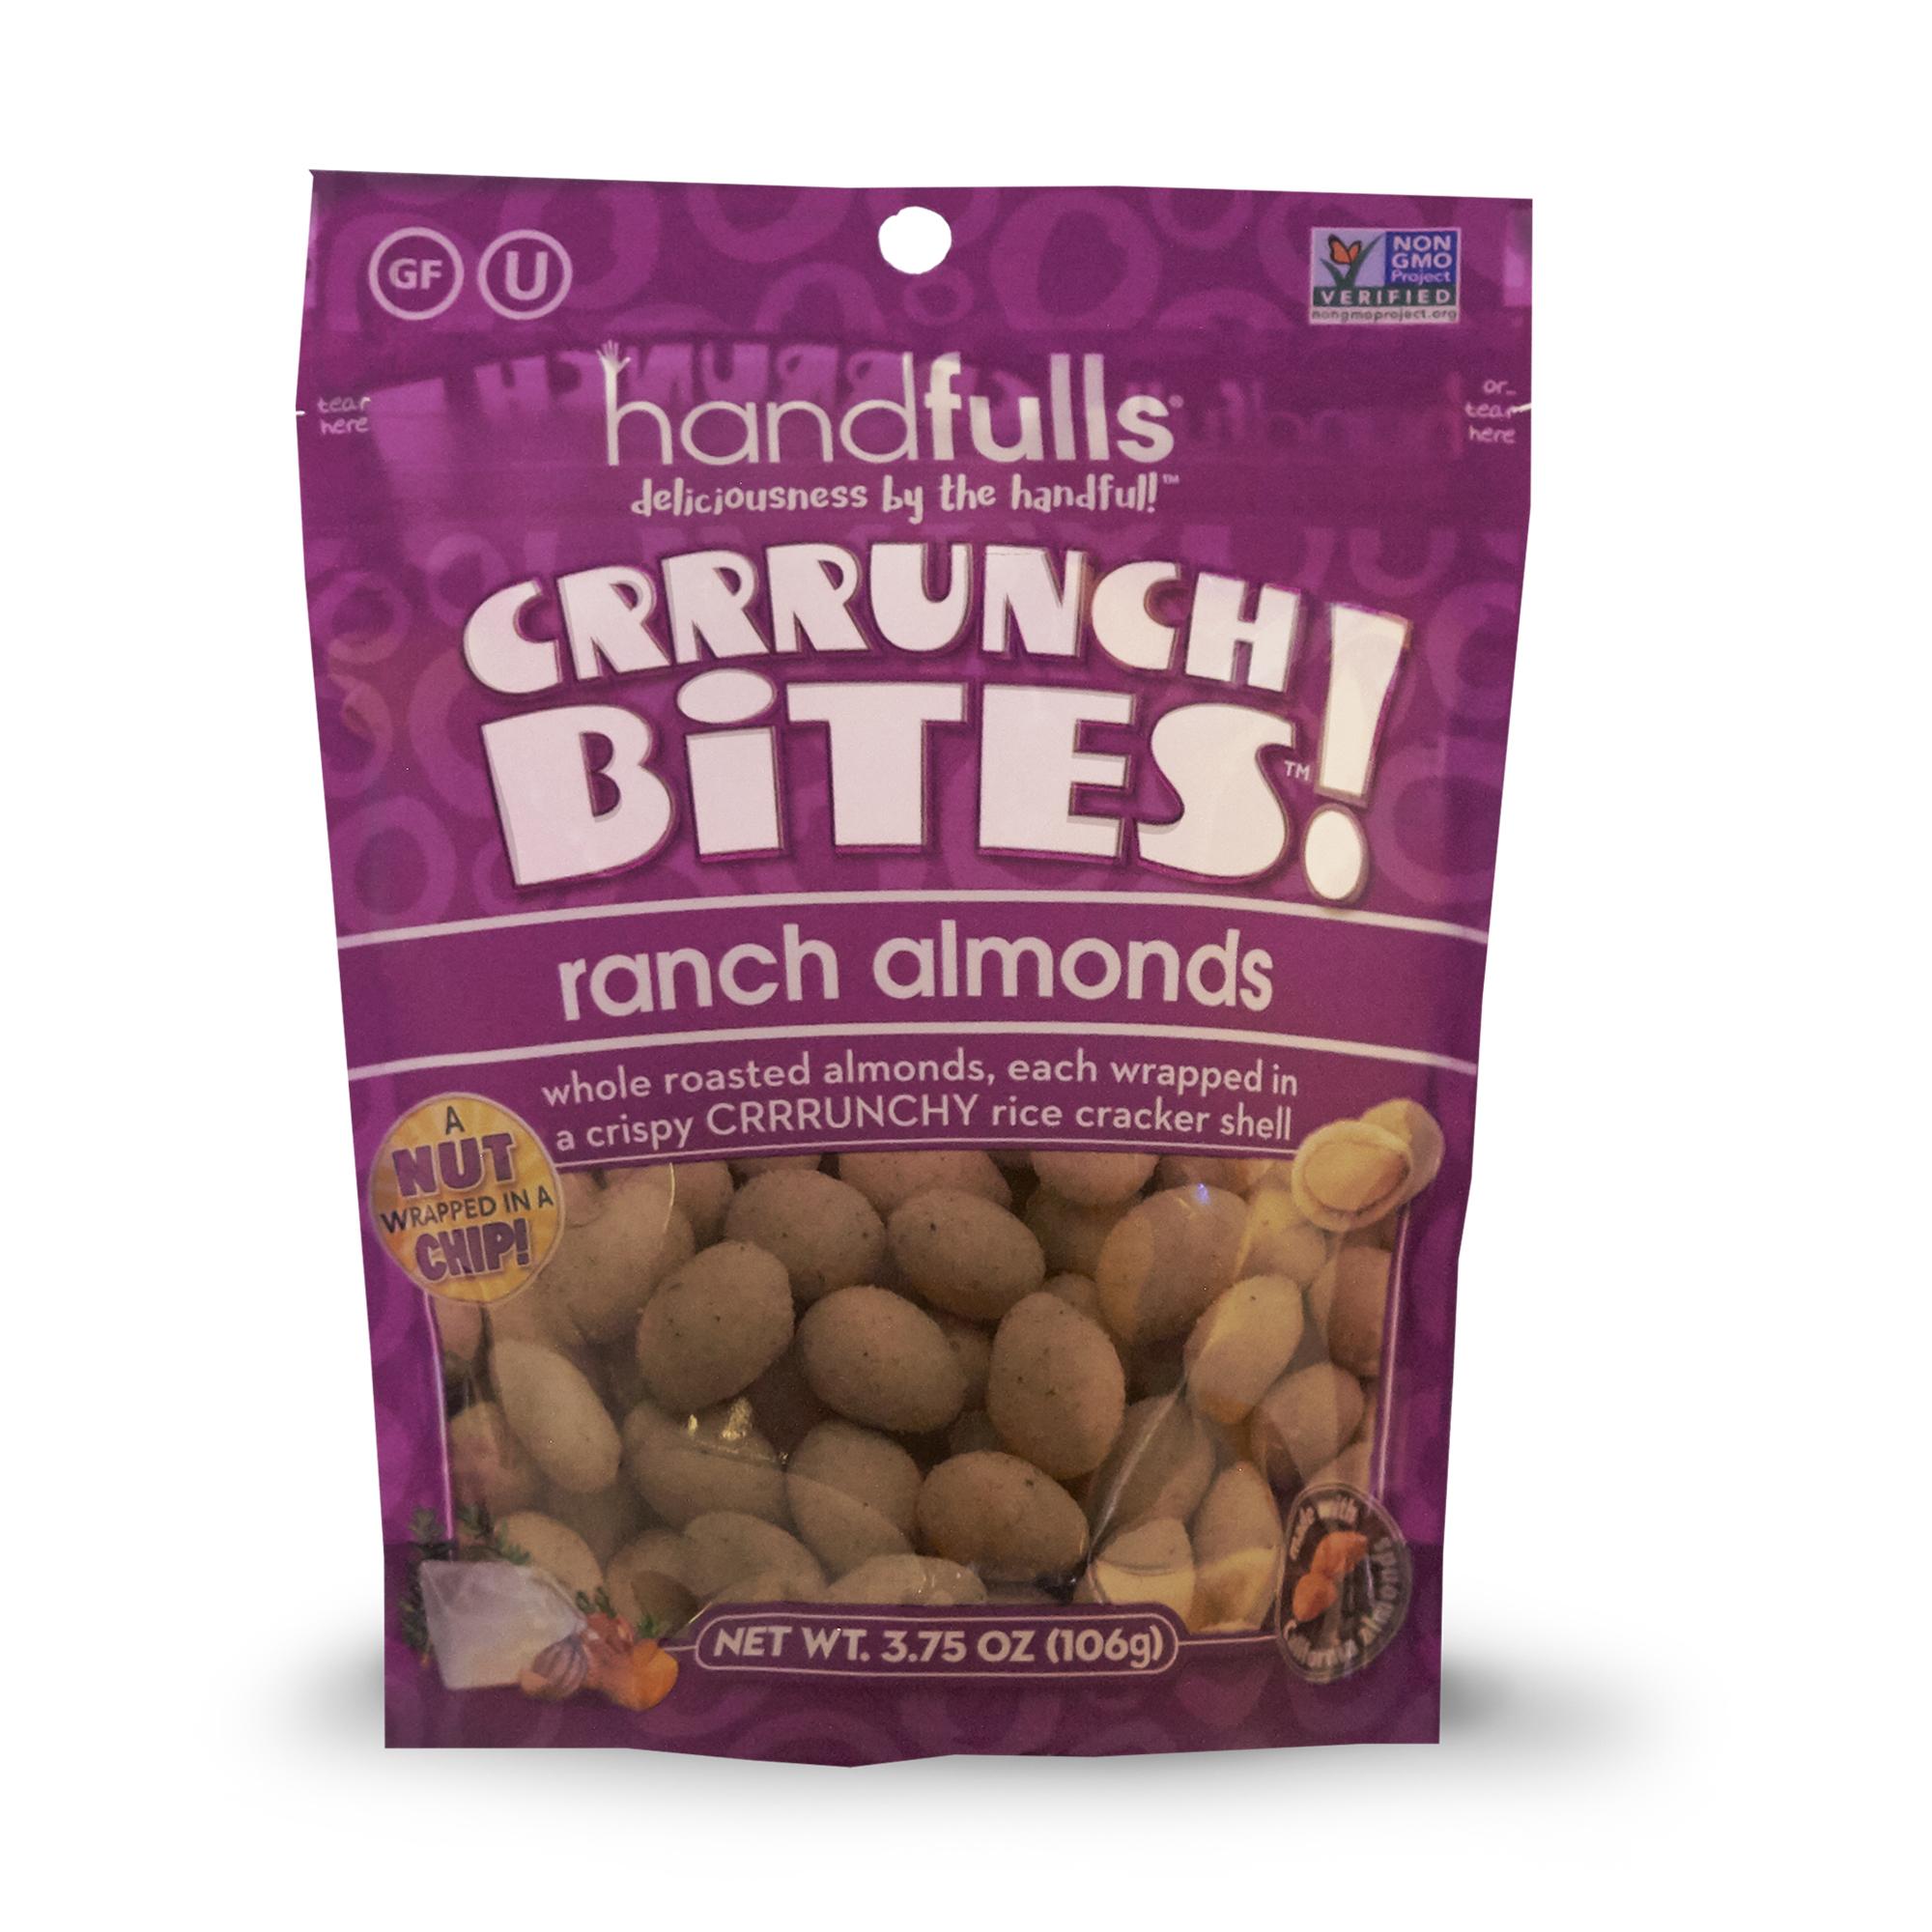 Handfulls_CrrrunchBites_Ranch_3.75oz_2000x2000px.jpg